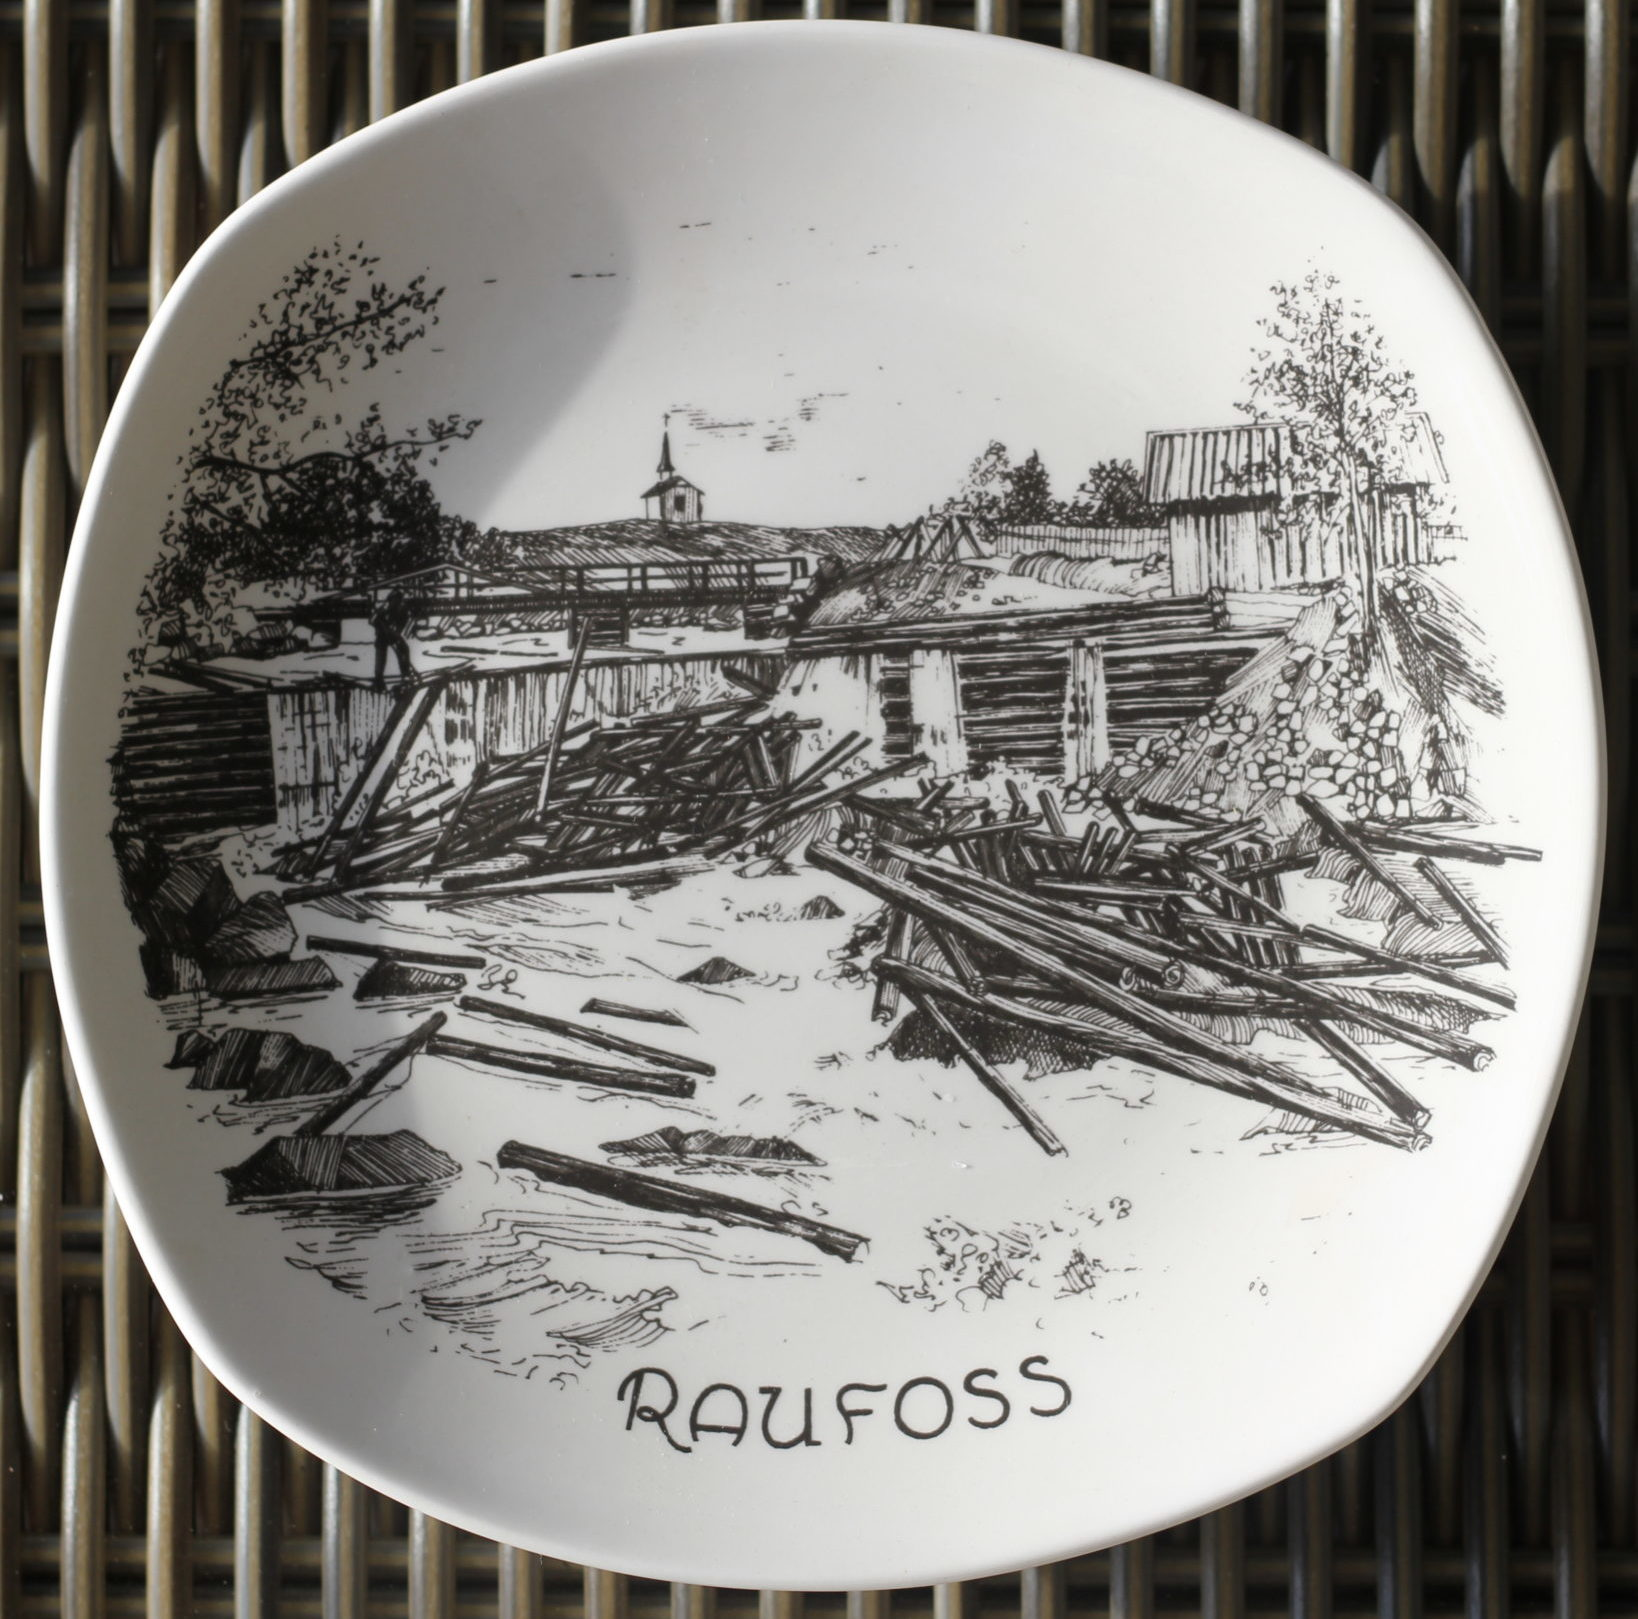 Tømmerfløting rundt 1900 tallet – Raufoss historie